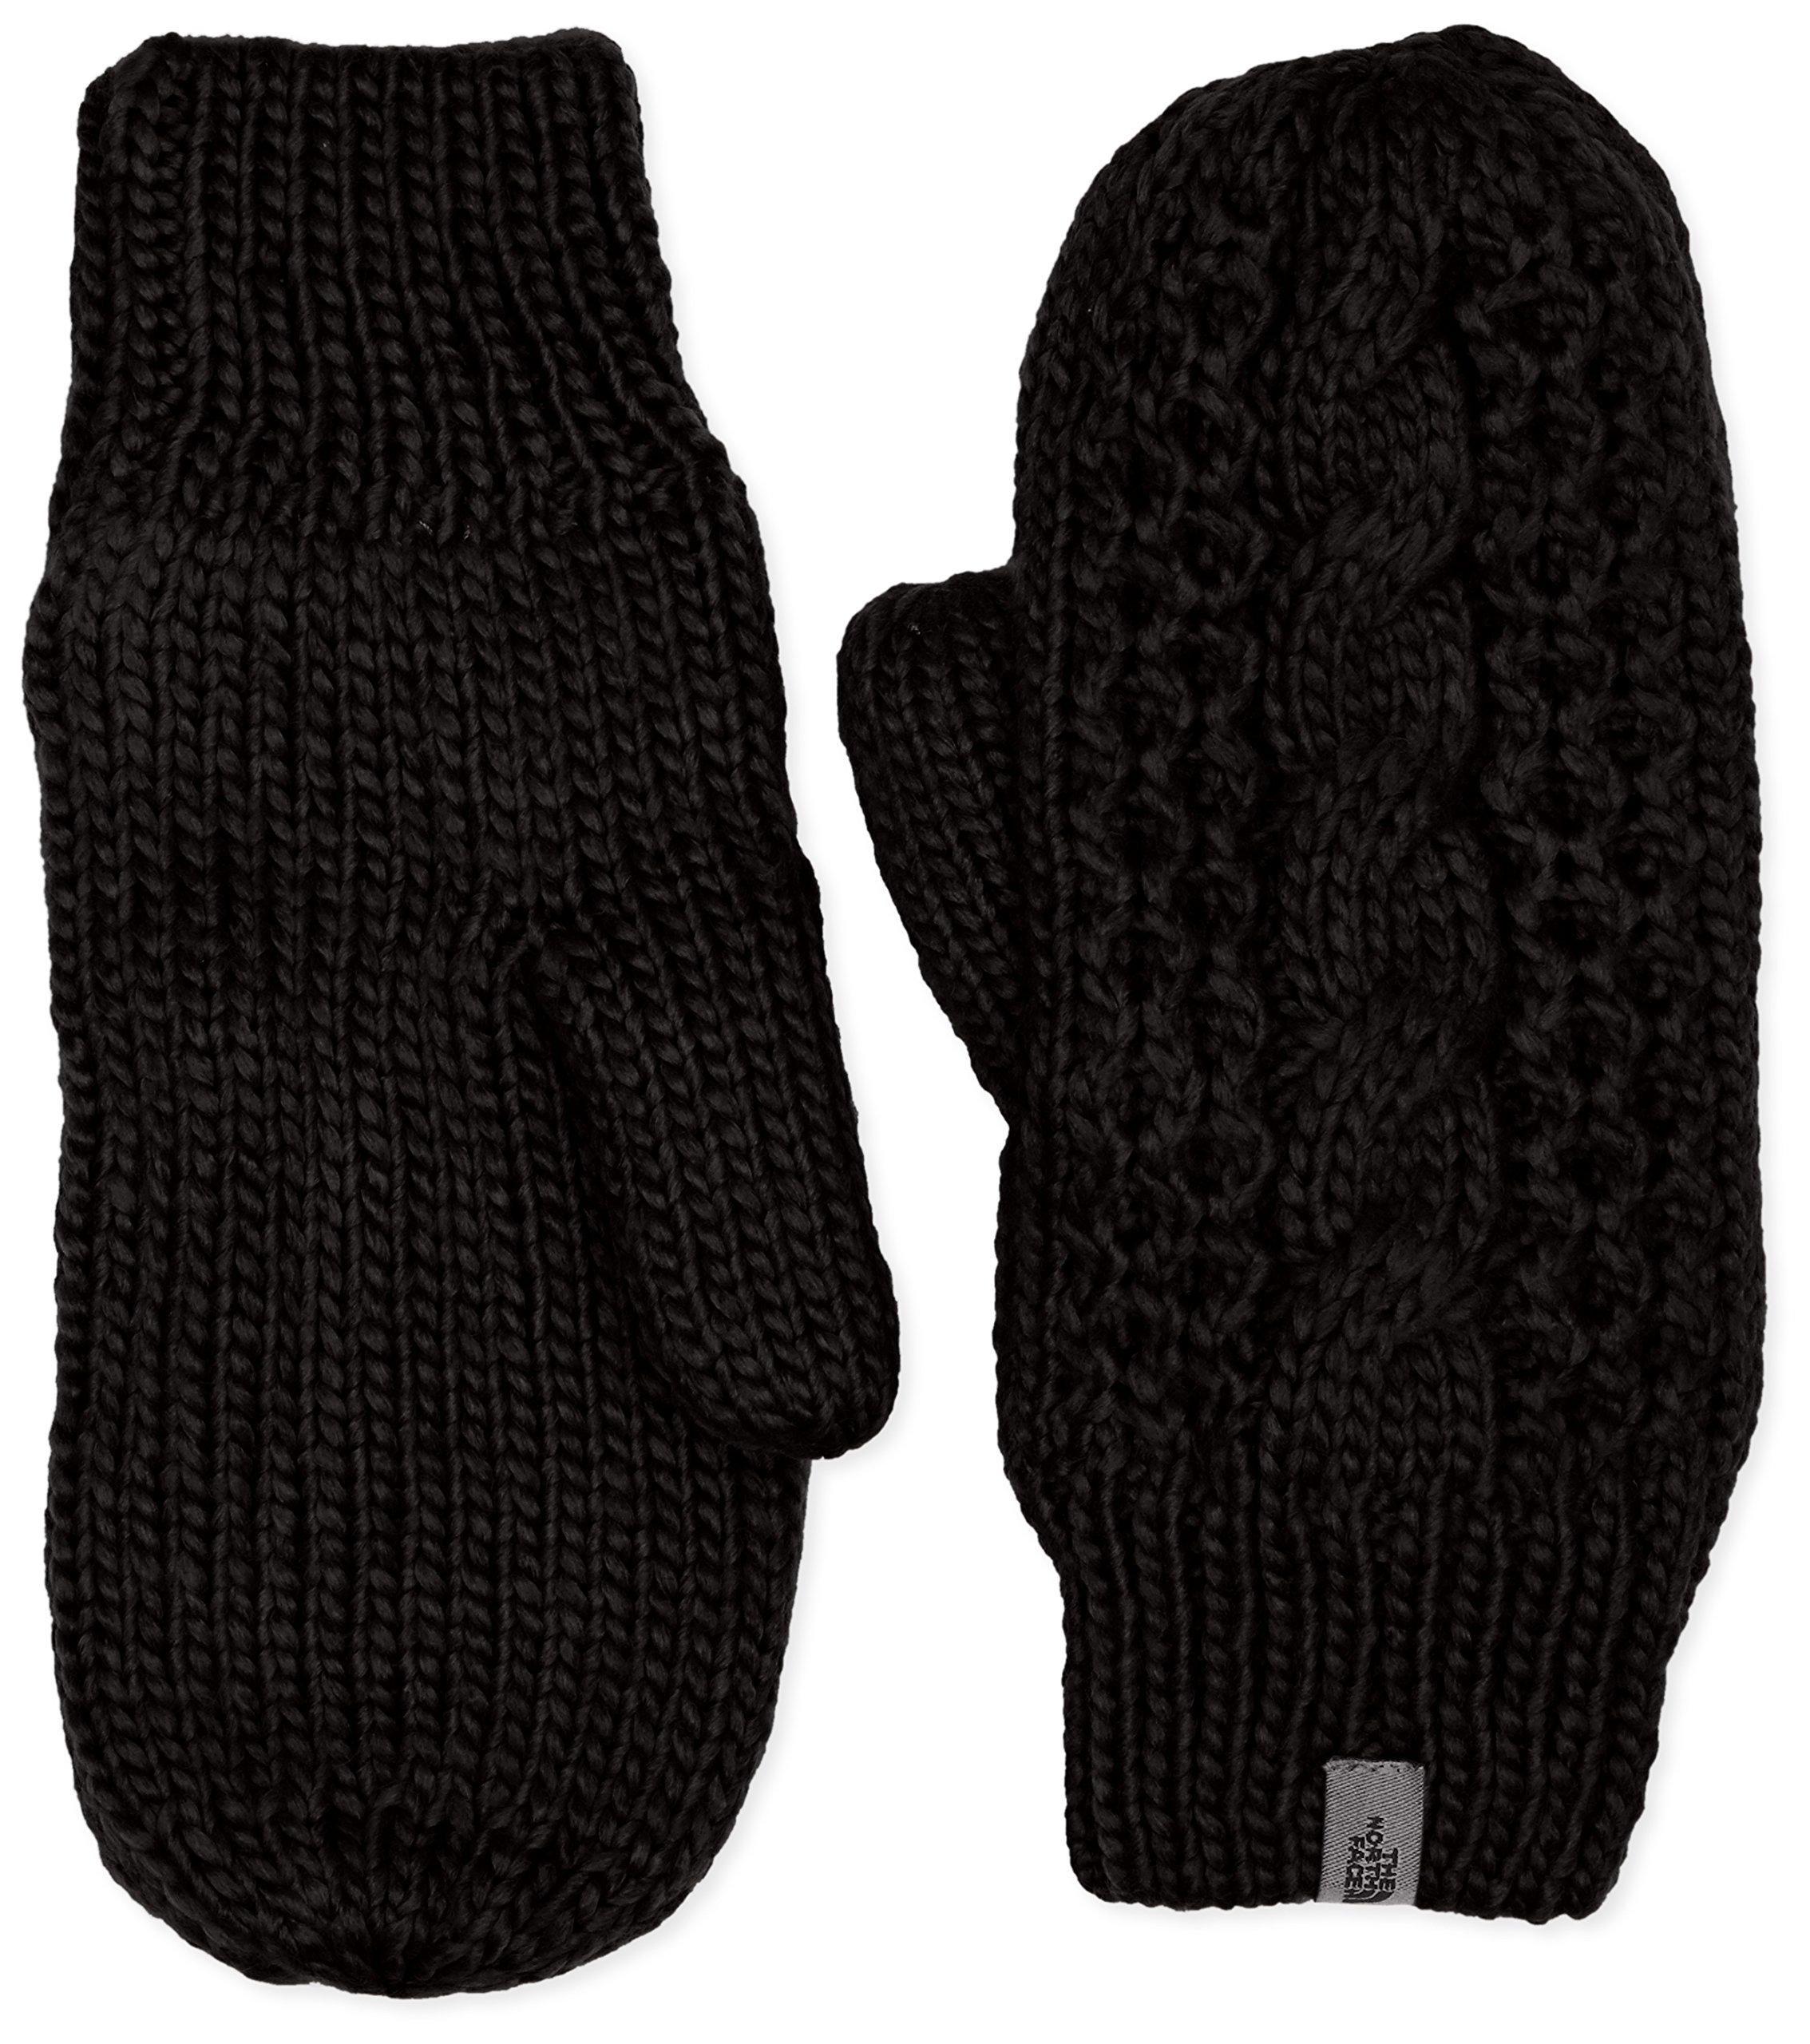 The North Face Cable Knit Mitt Women's TNF Black Small/Medium